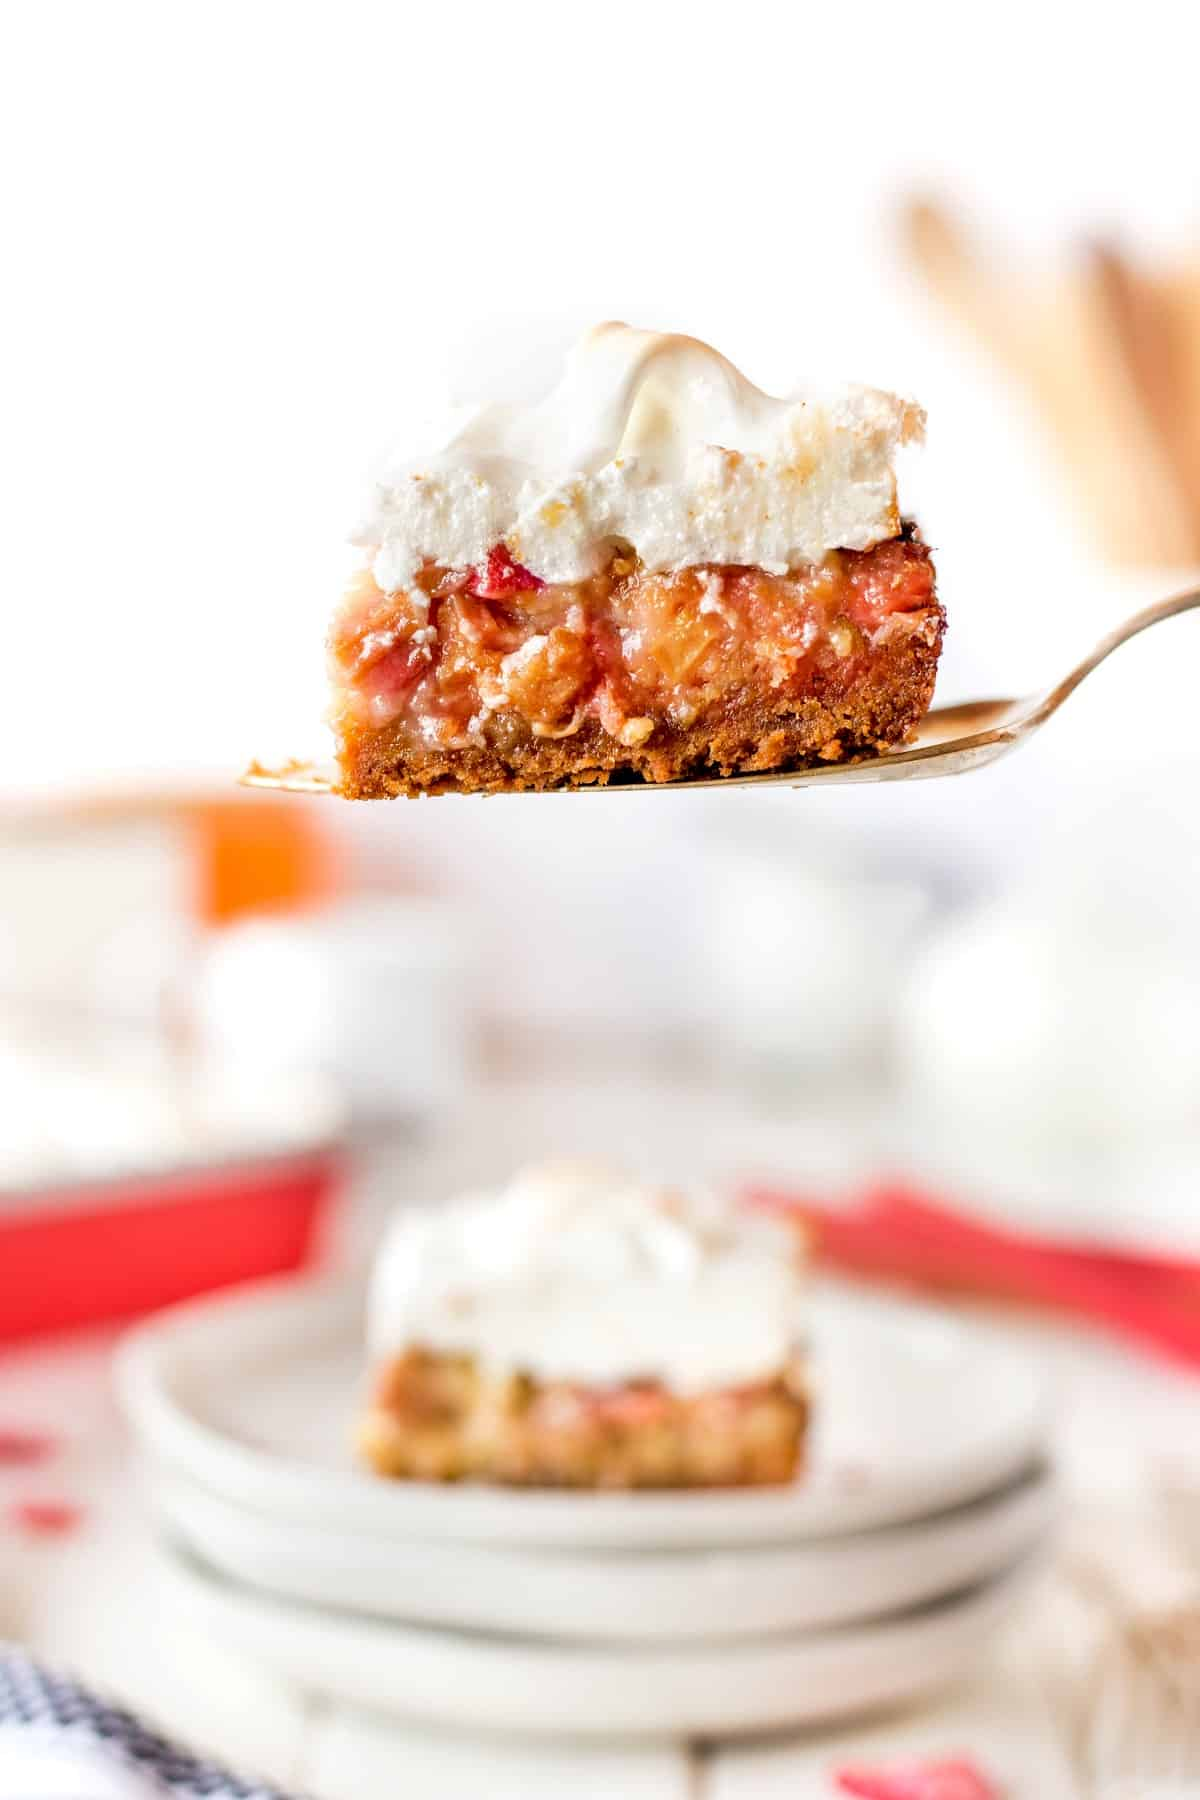 Rhubarb Meringue Dessert on a server.